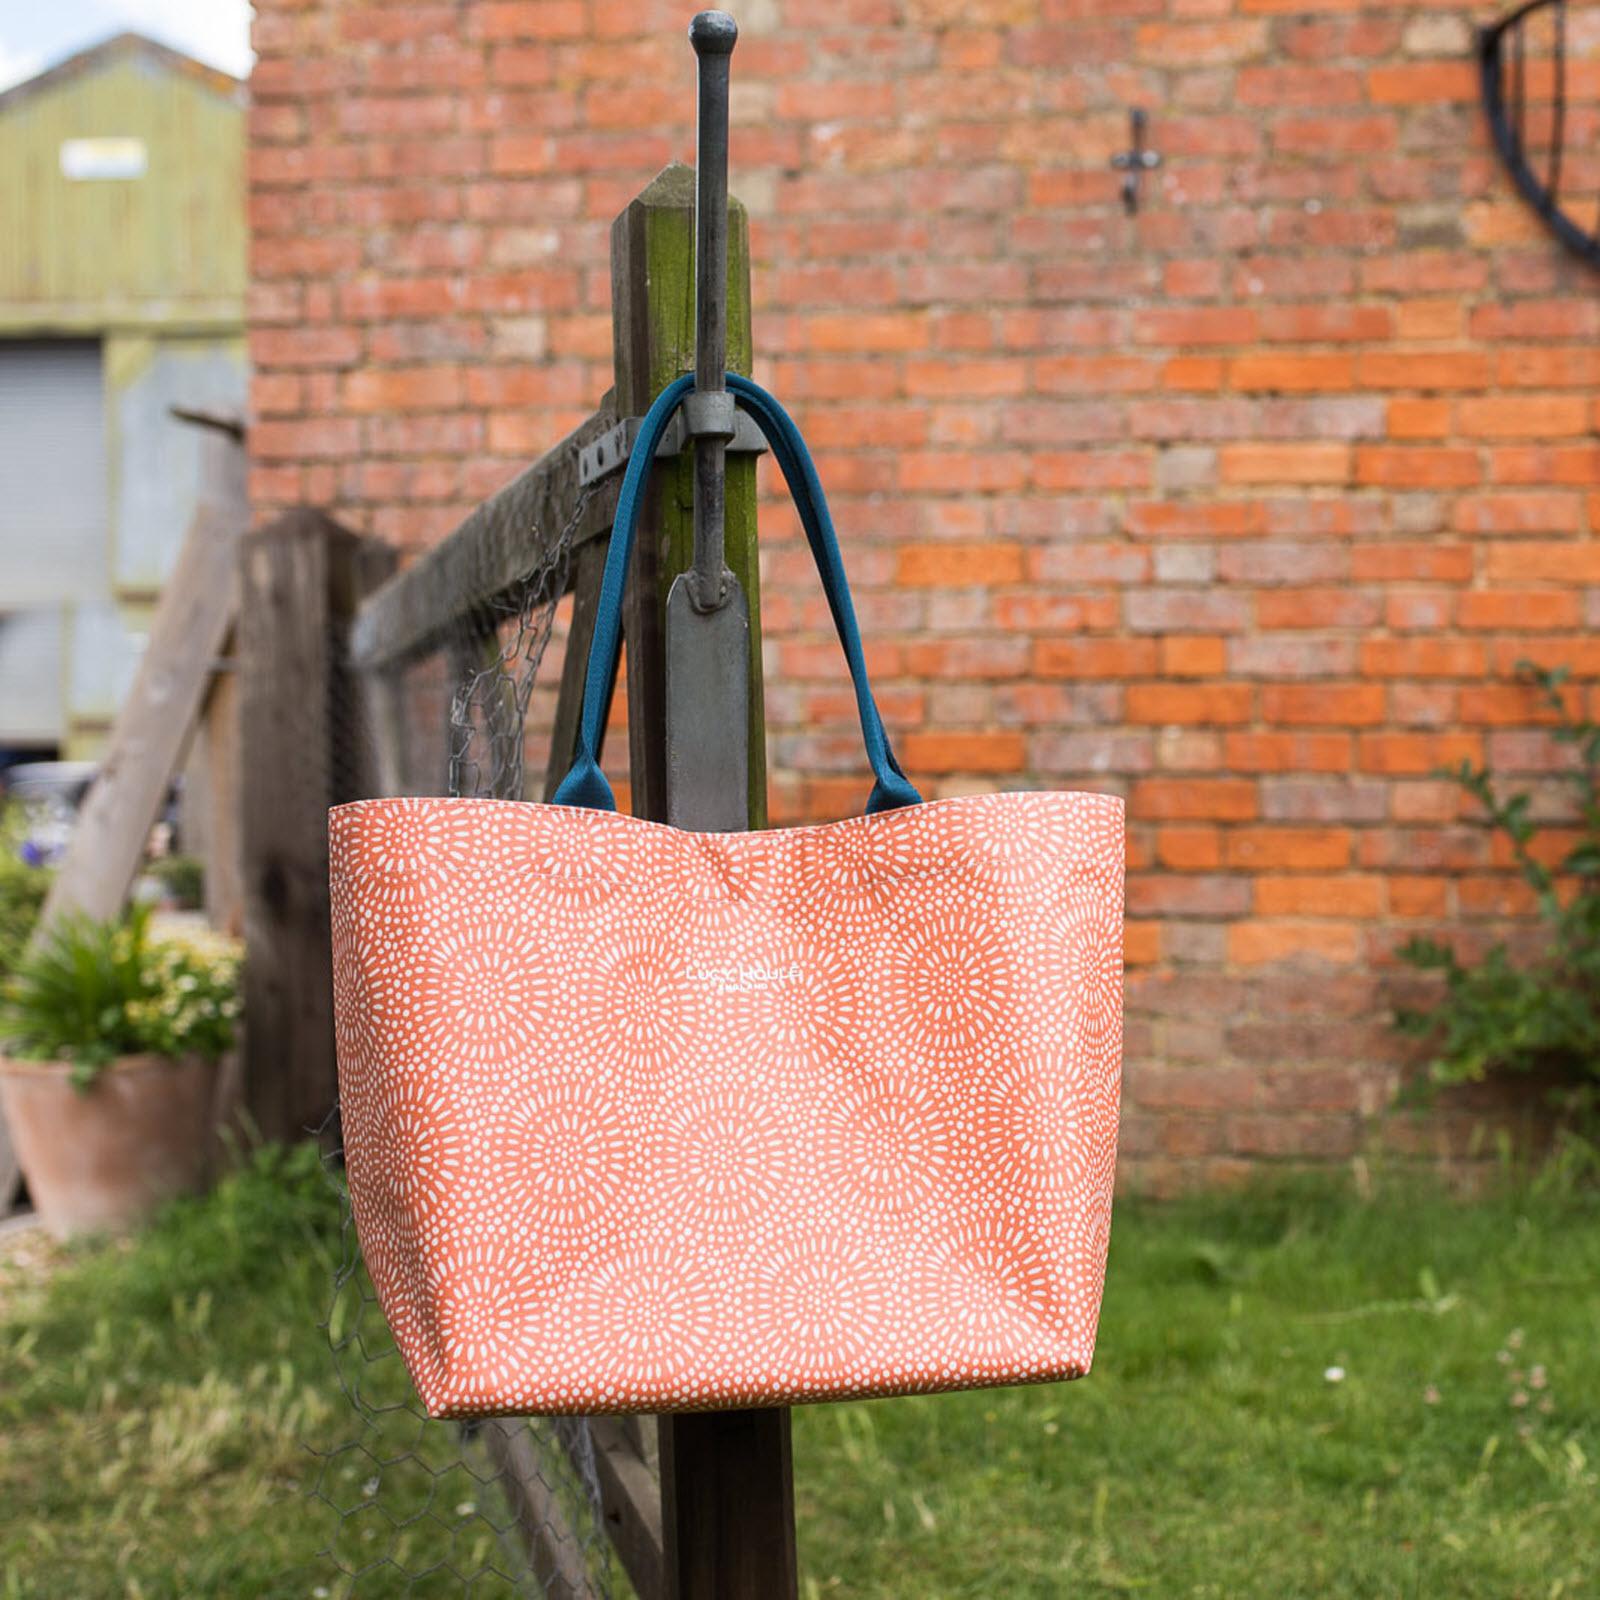 Amber Sunburst Medium Zip Tote Bag with Teal Handles